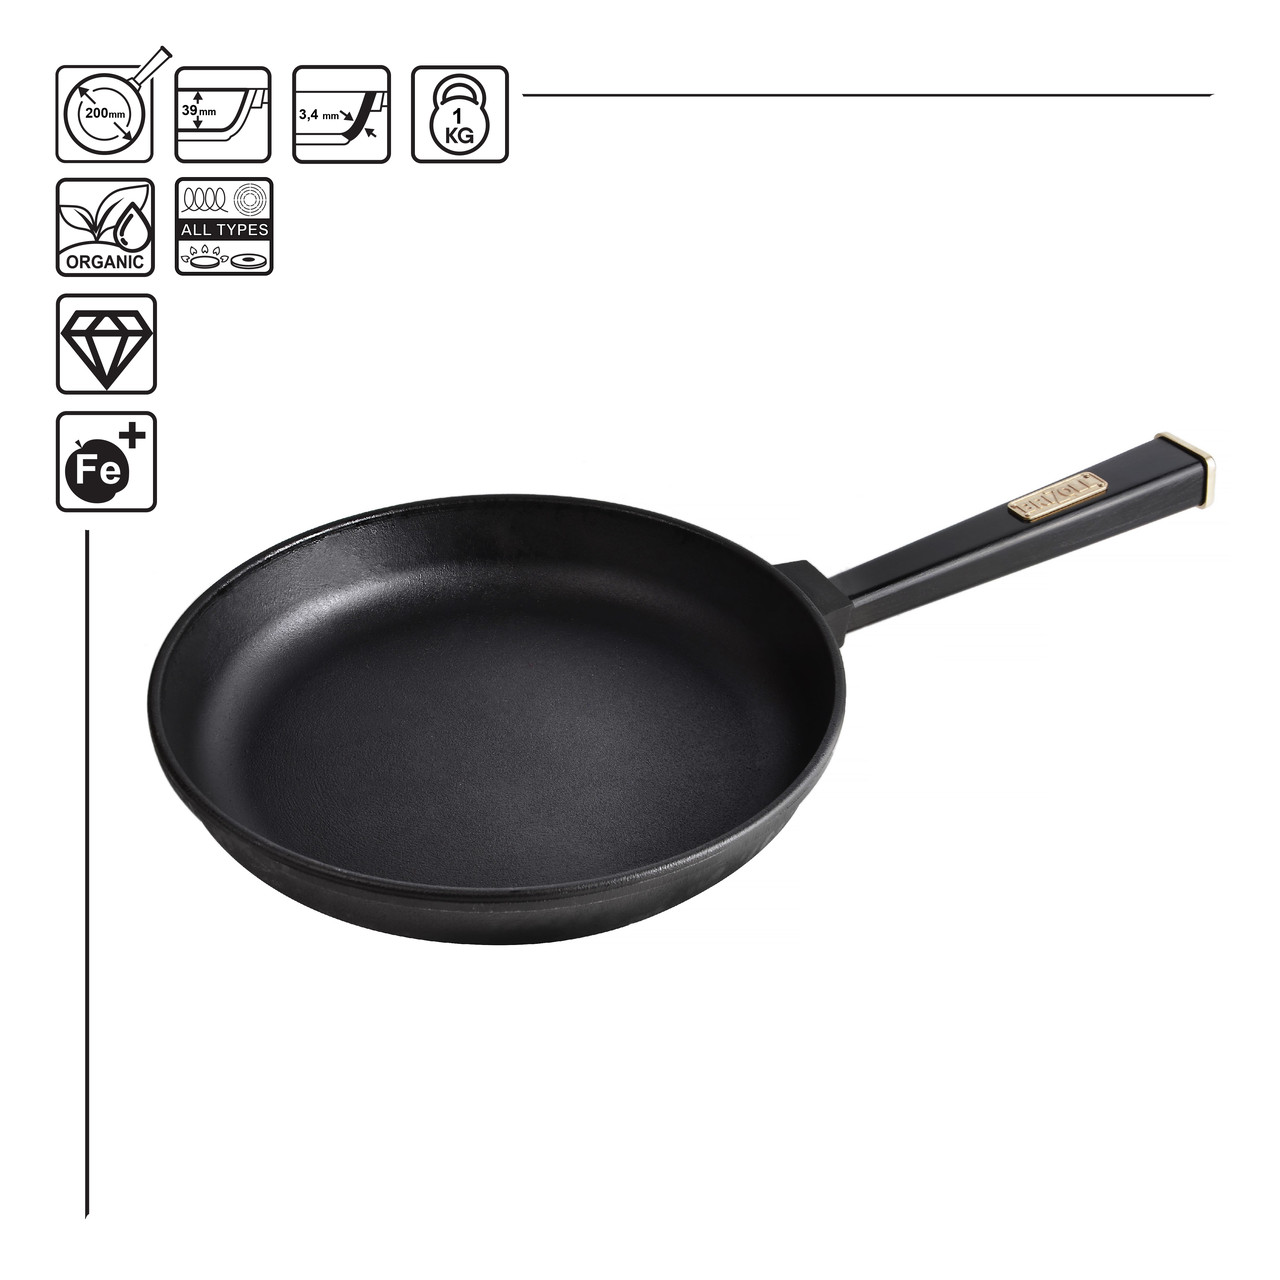 Сковорода чавунна Optima-Black, 200х35 мм